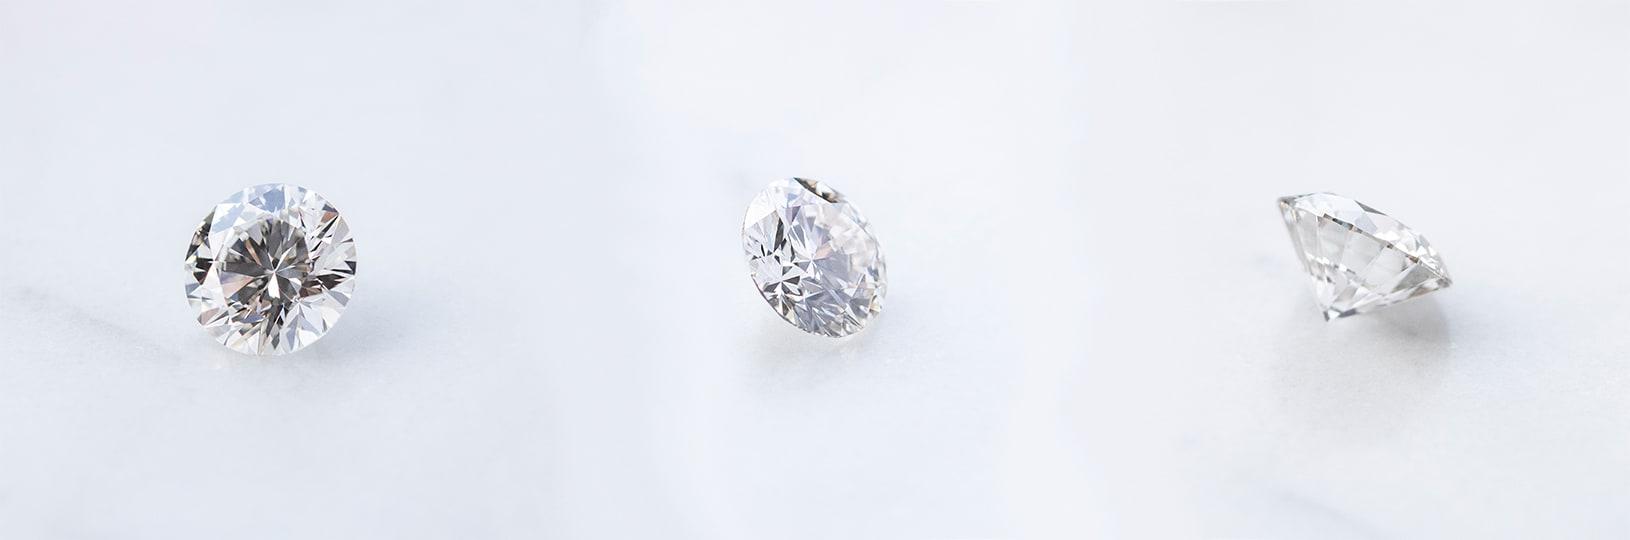 Three Nexus Diamond™ alternative stones